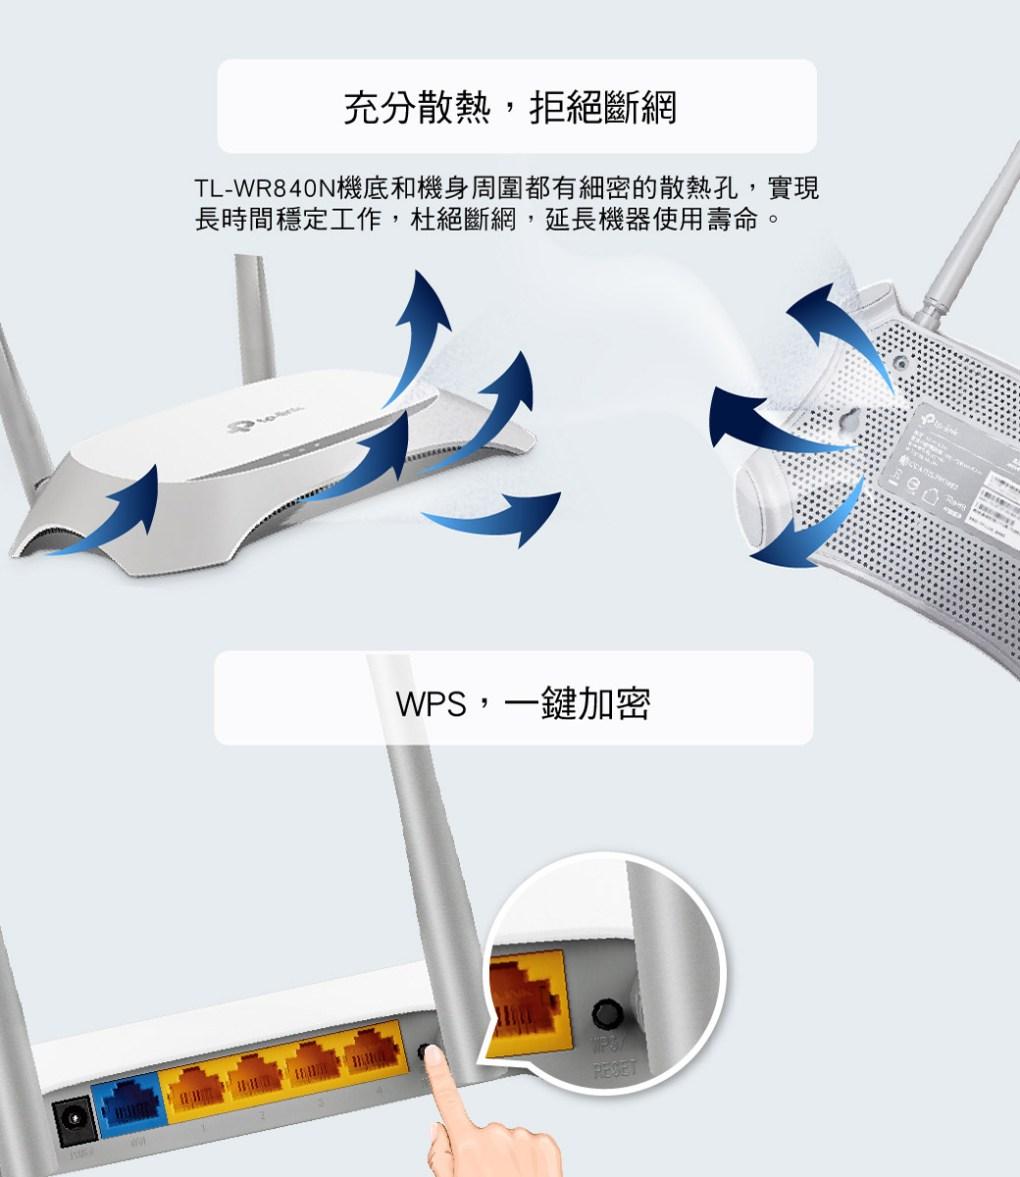 TP-Link TL-WR840N 300Mbps 無線網路 WiFi 路由器(分享器) - TP Link TL WR840N 6